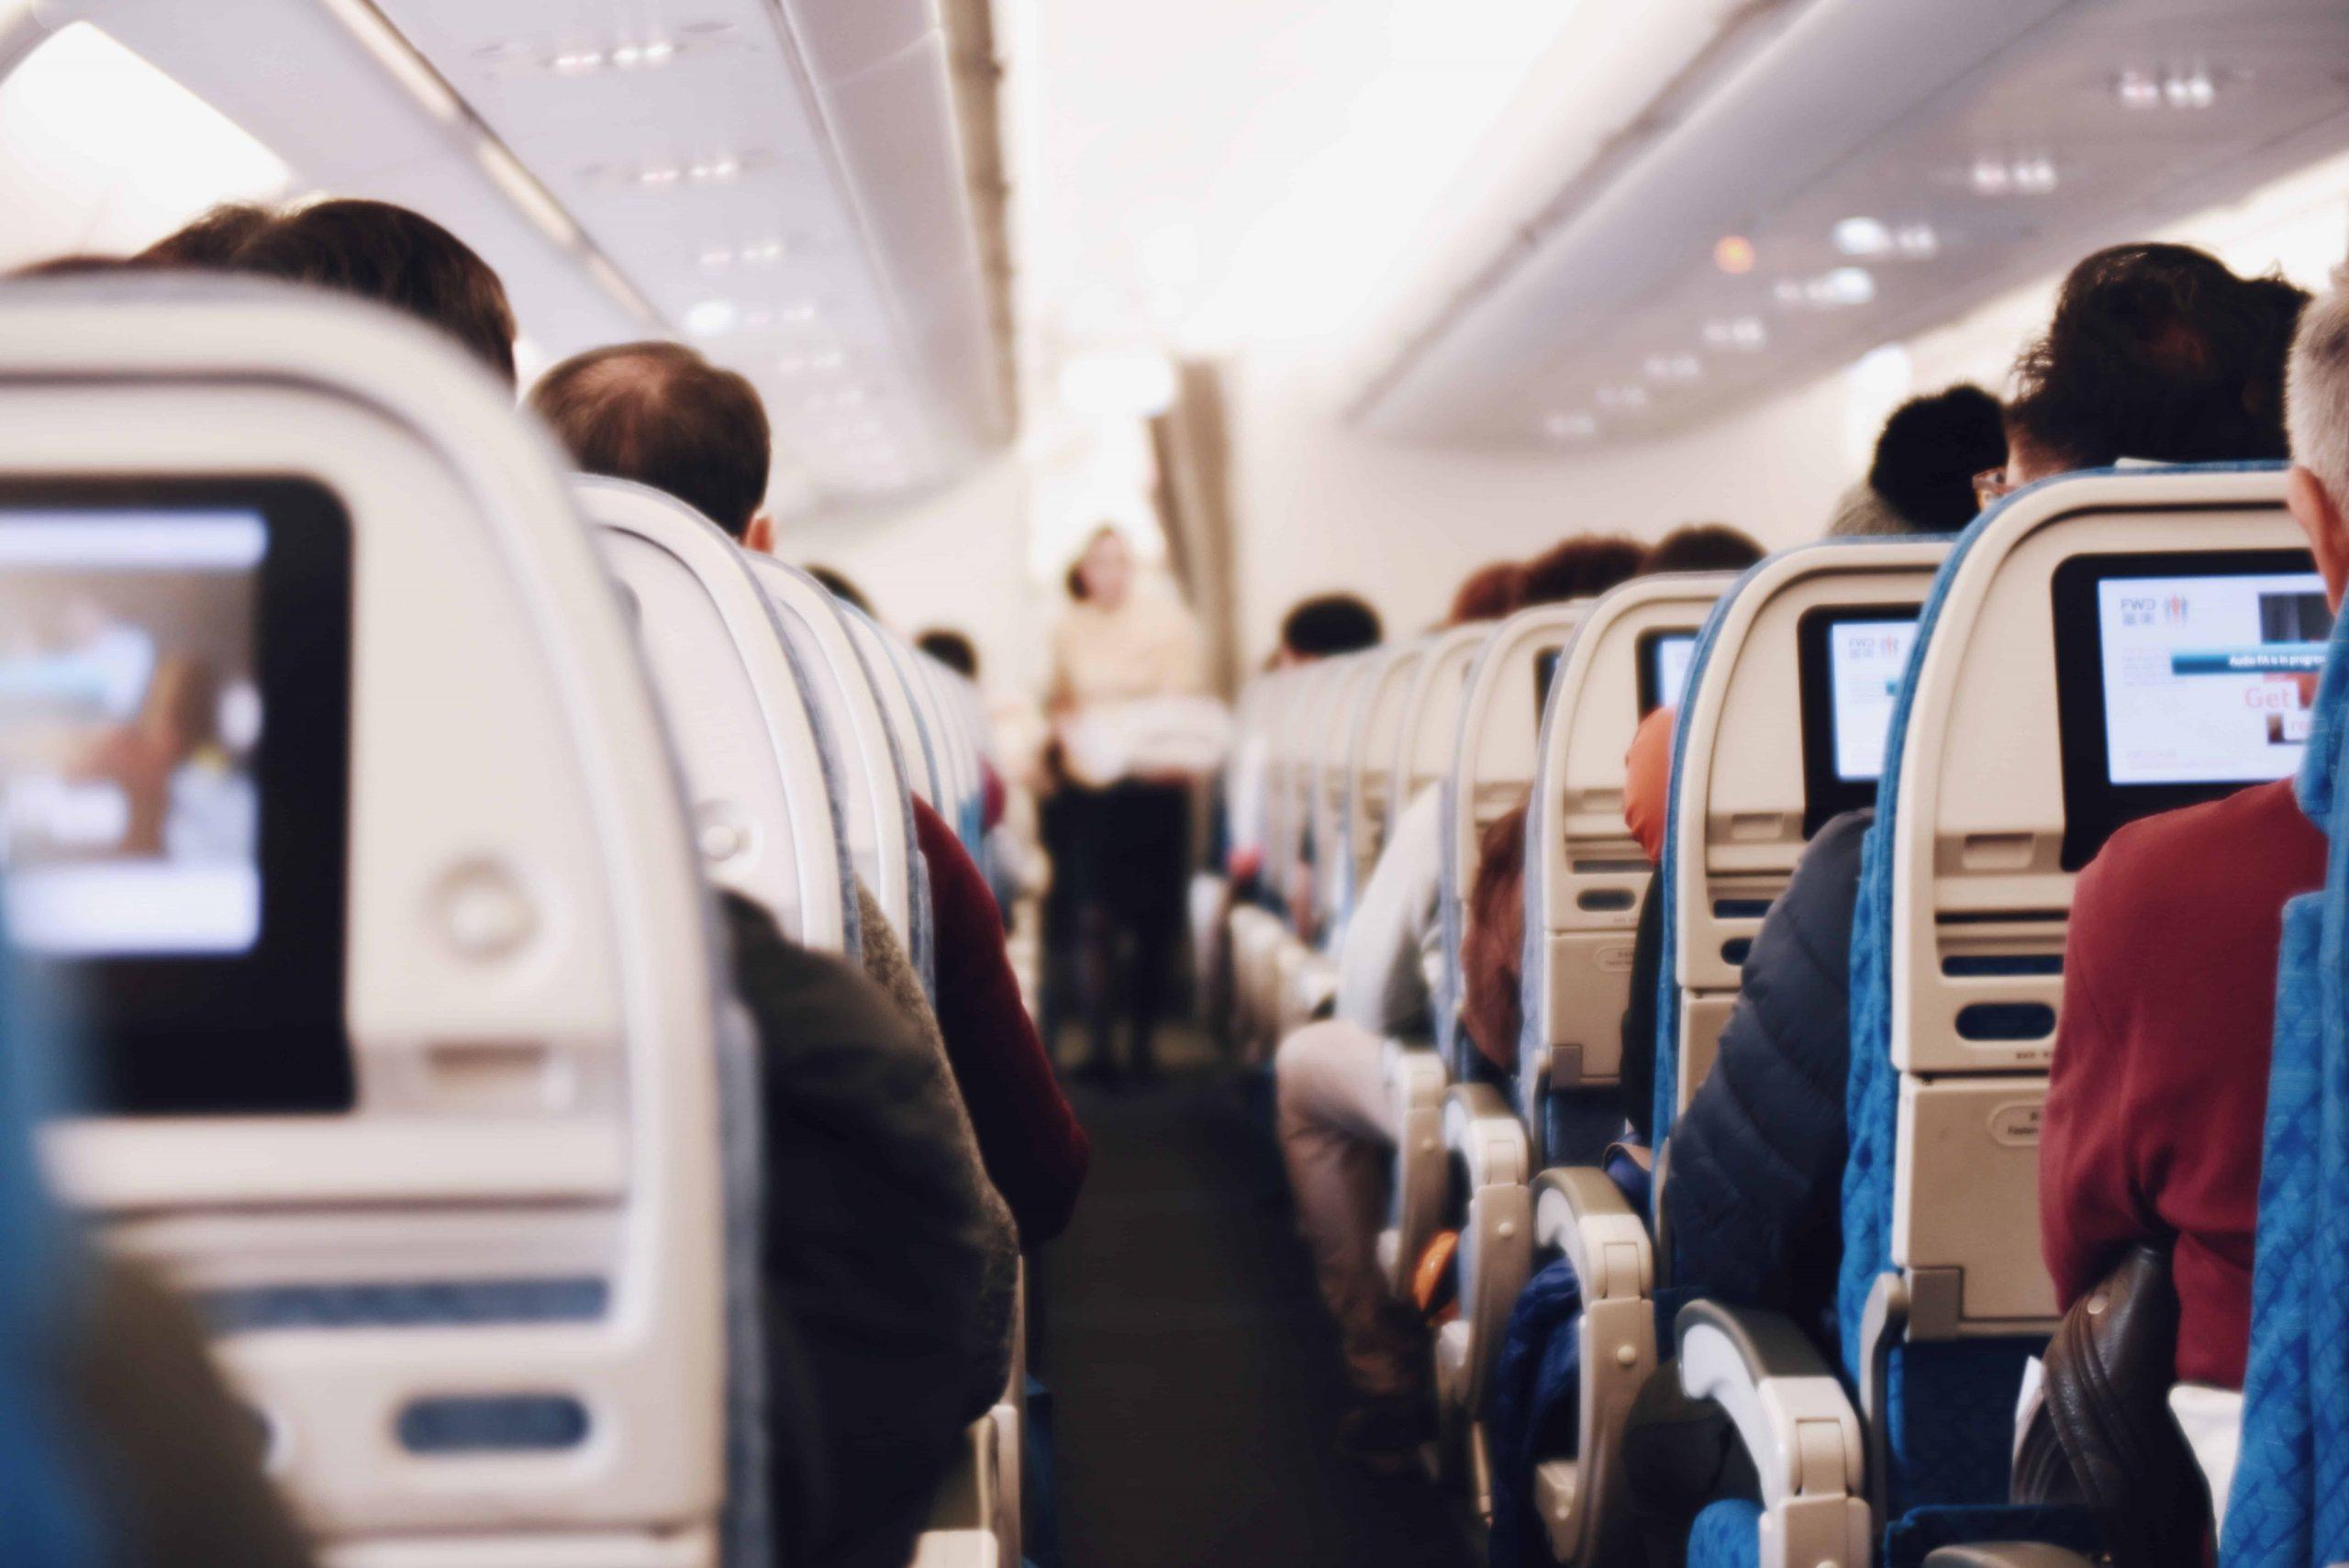 Top 10 Behaviors to Avoid When Flying